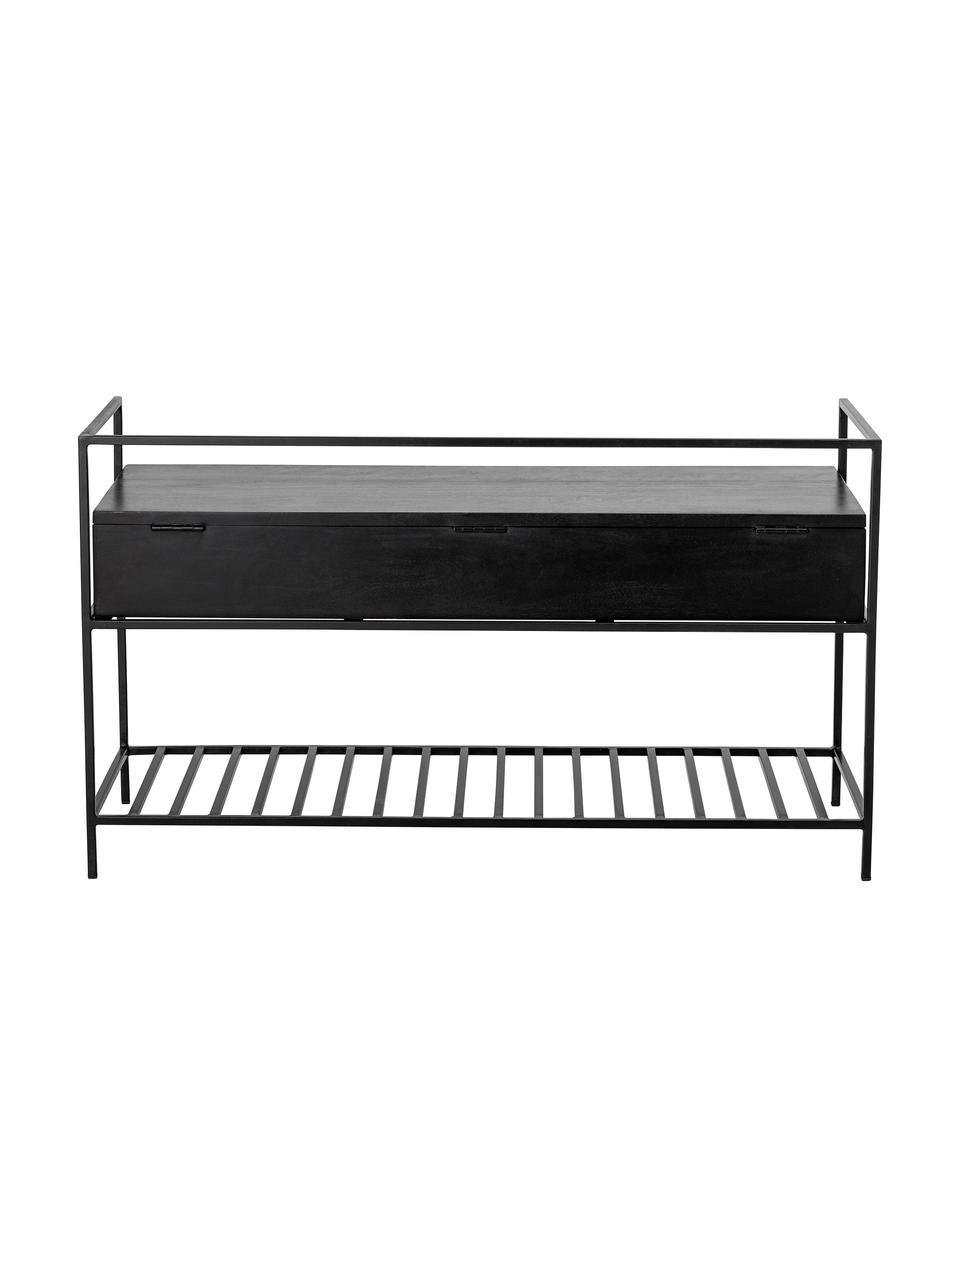 Garderobebank Abelone met opbergruimte, Zitvlak: gecoat mangohout, Frame: gecoat metaal, Zwart, B 102 x D 40 cm